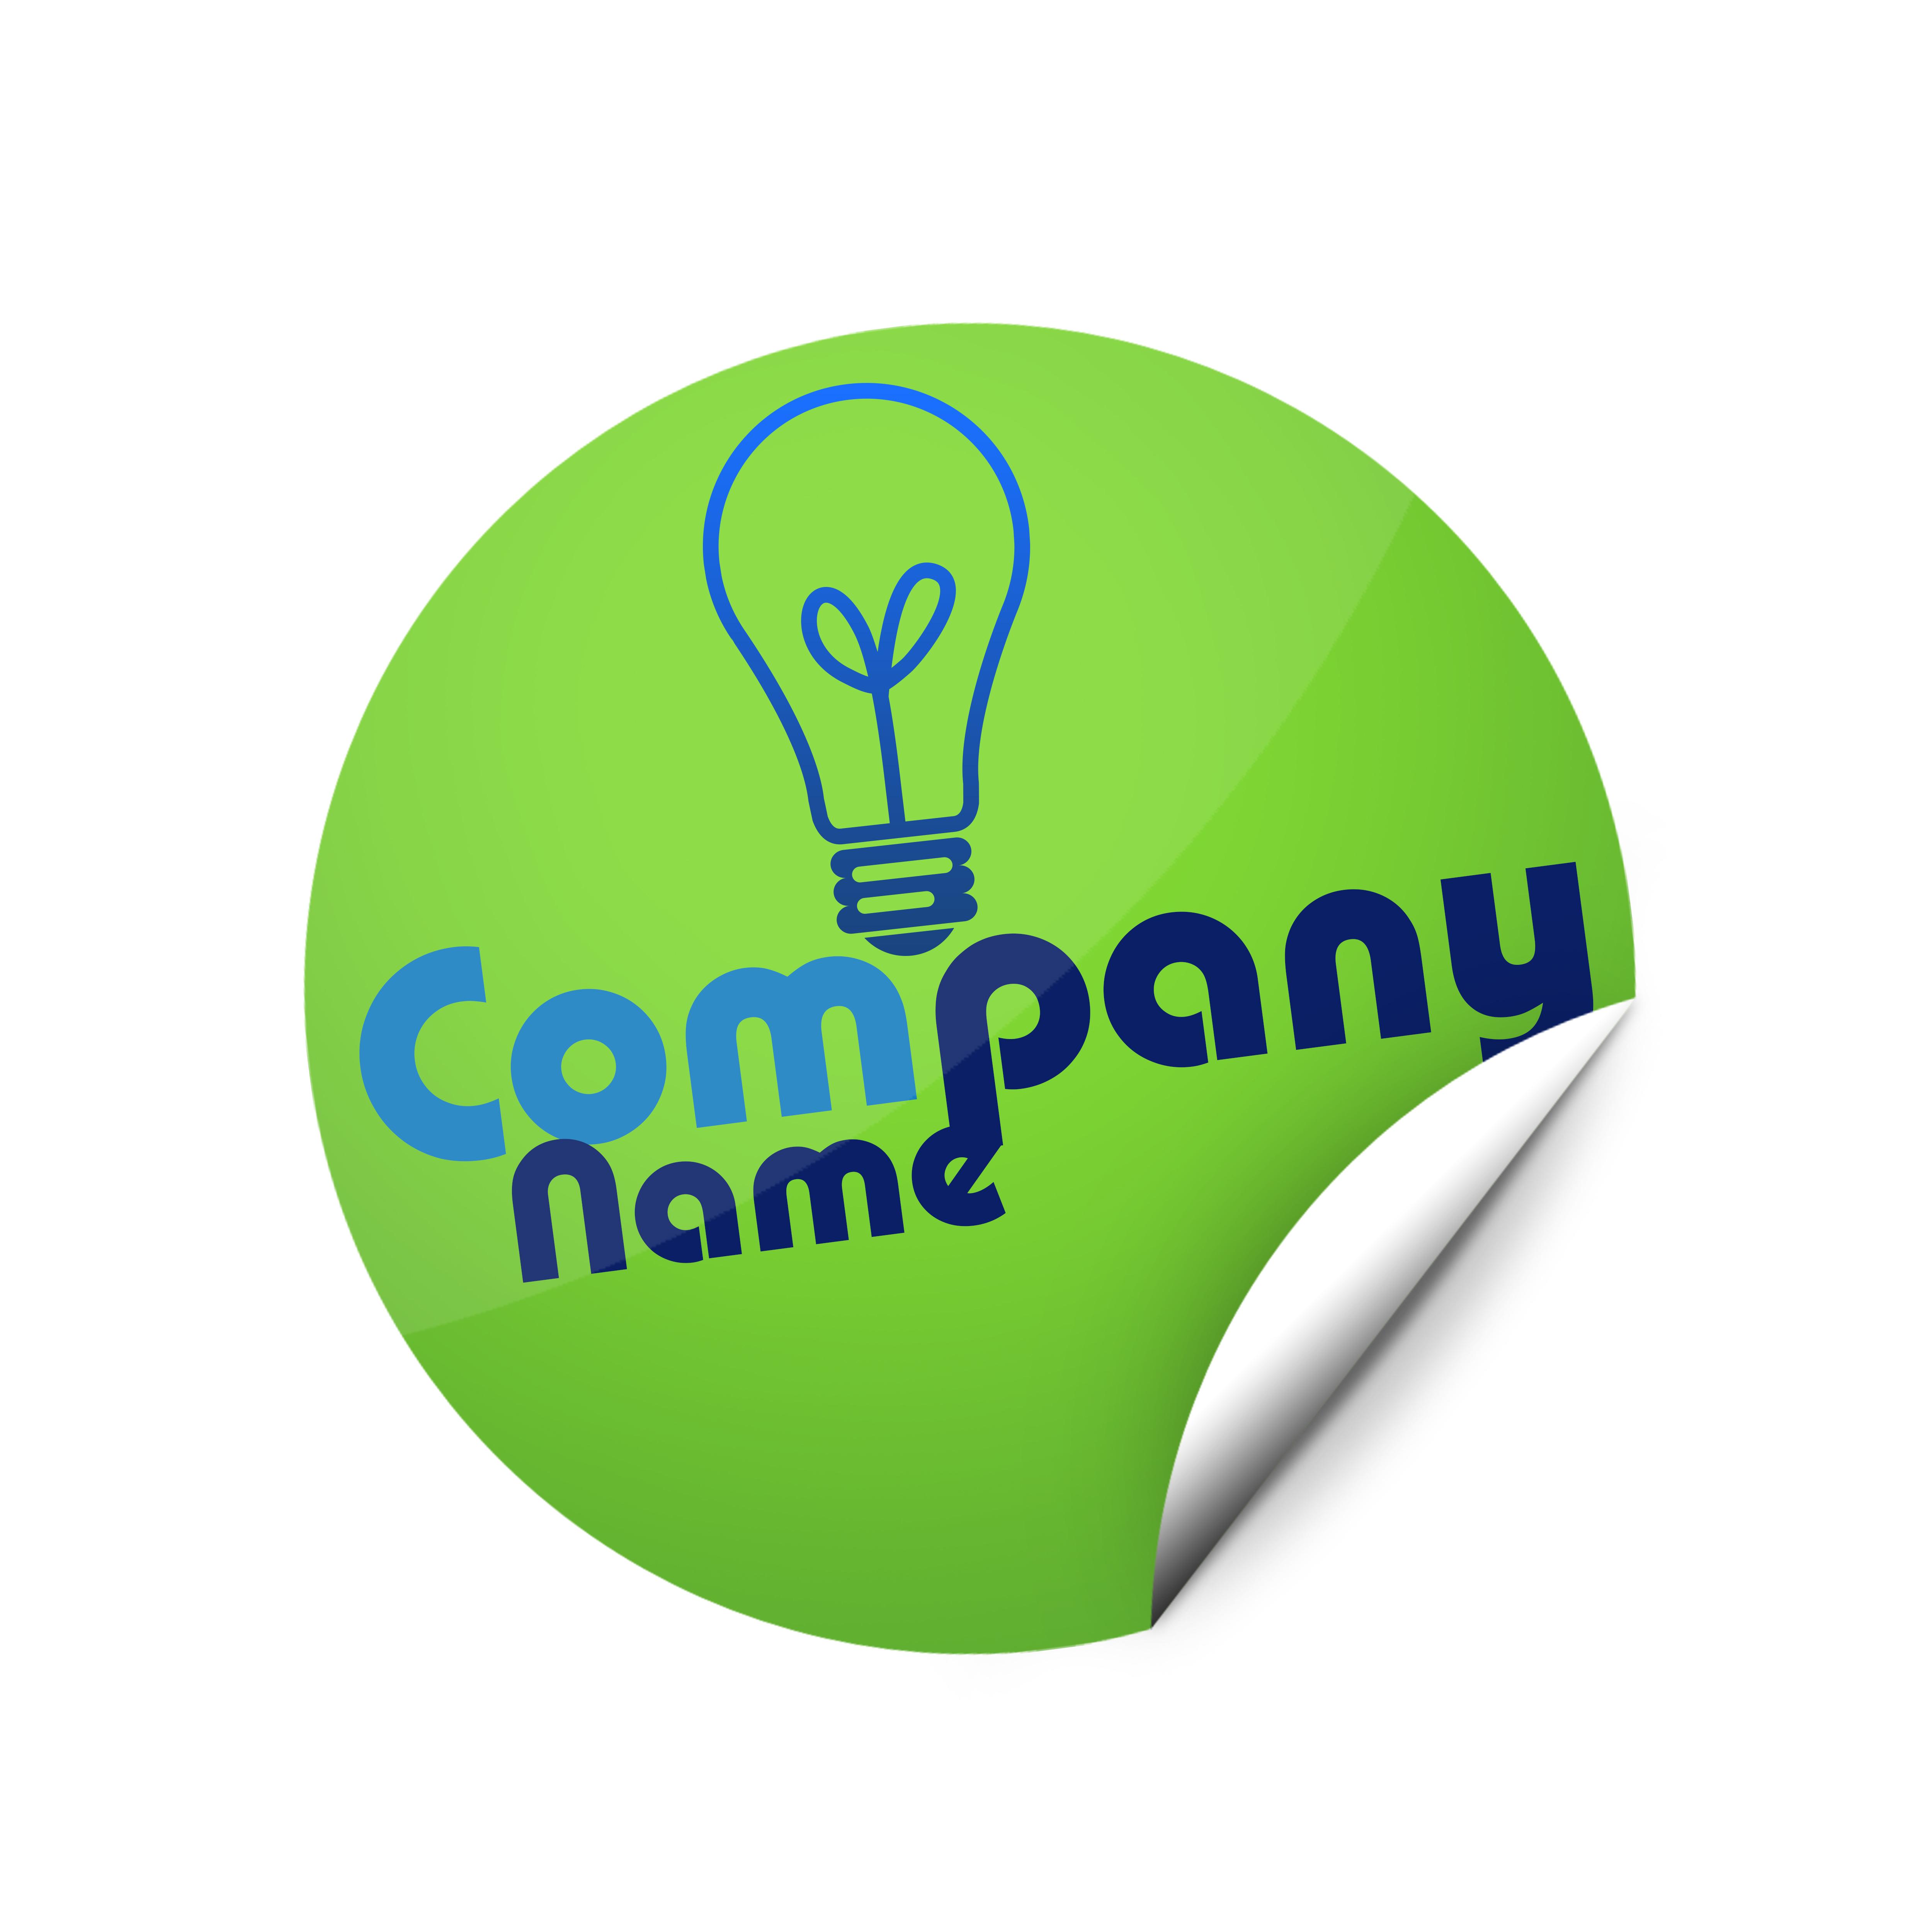 Nice Idea logo